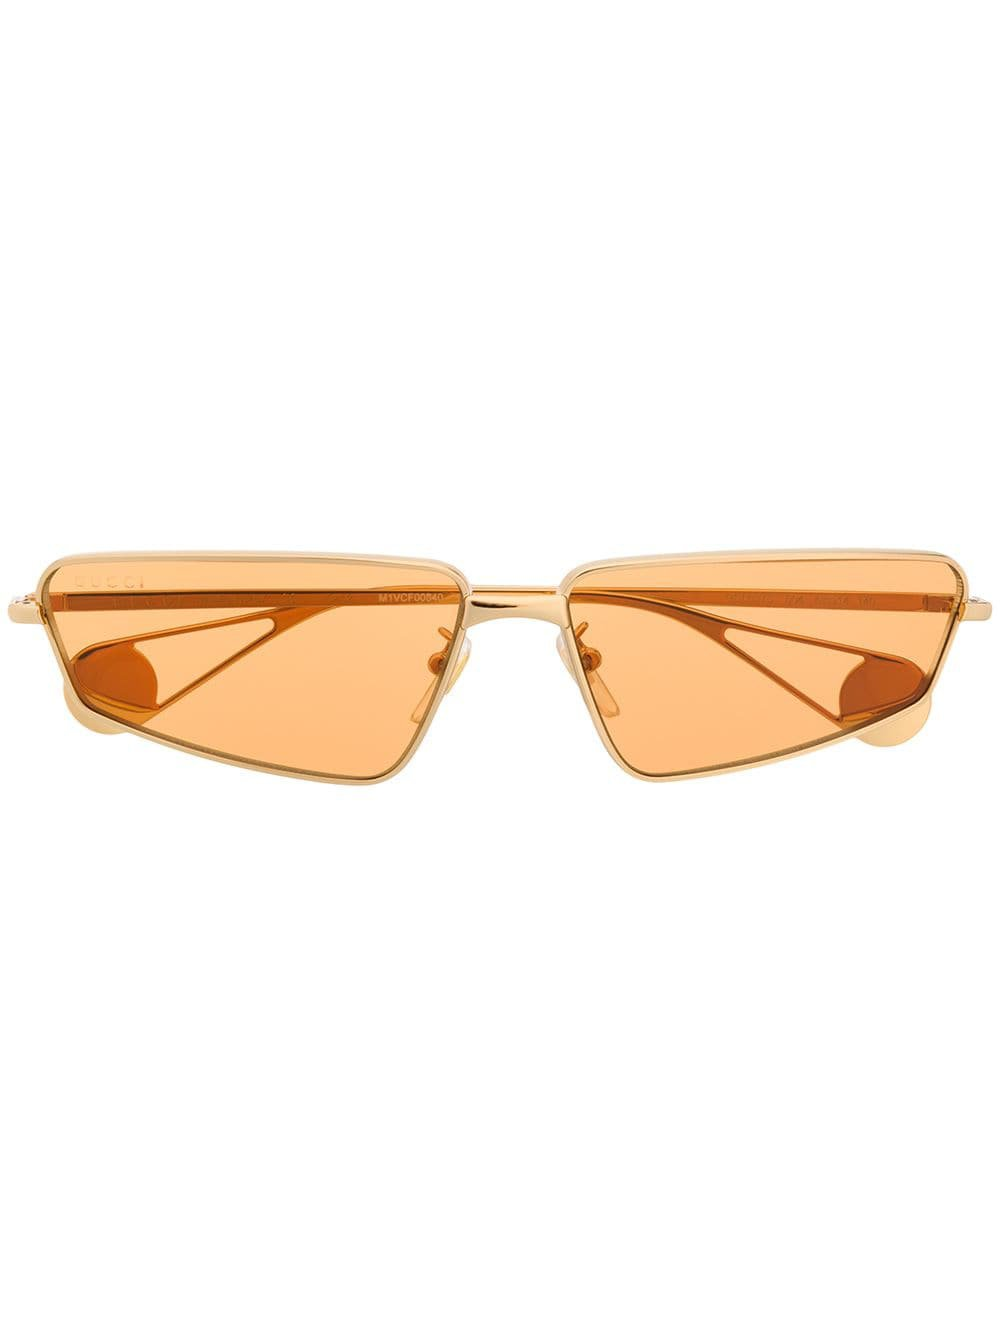 Gucci Eyewear Tinted Sunglasses